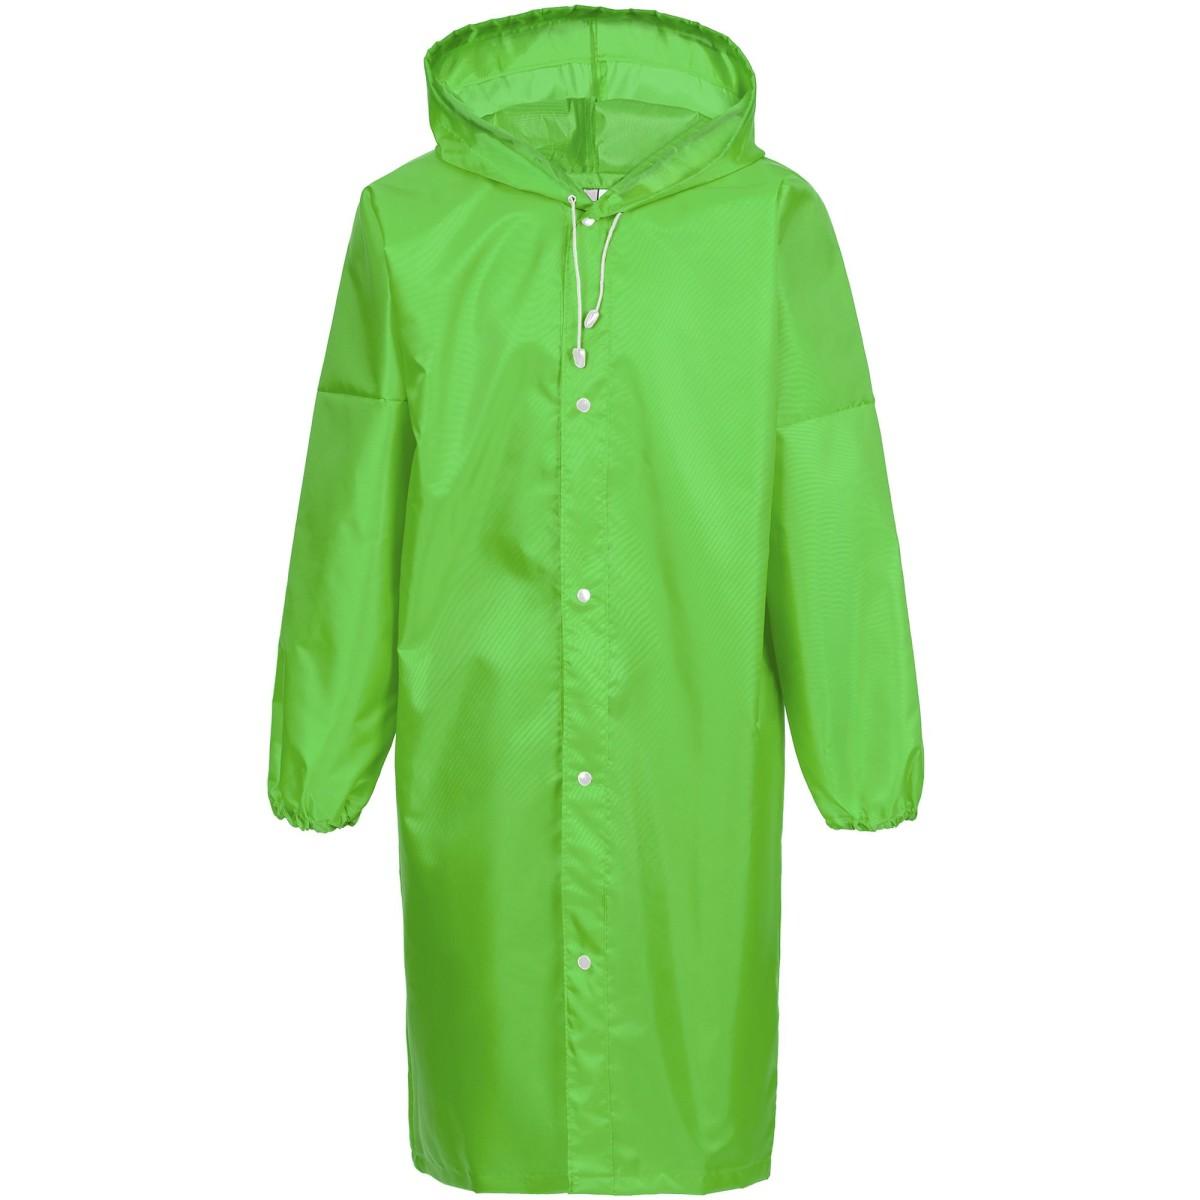 Дождевик Rainman Strong Зеленый L